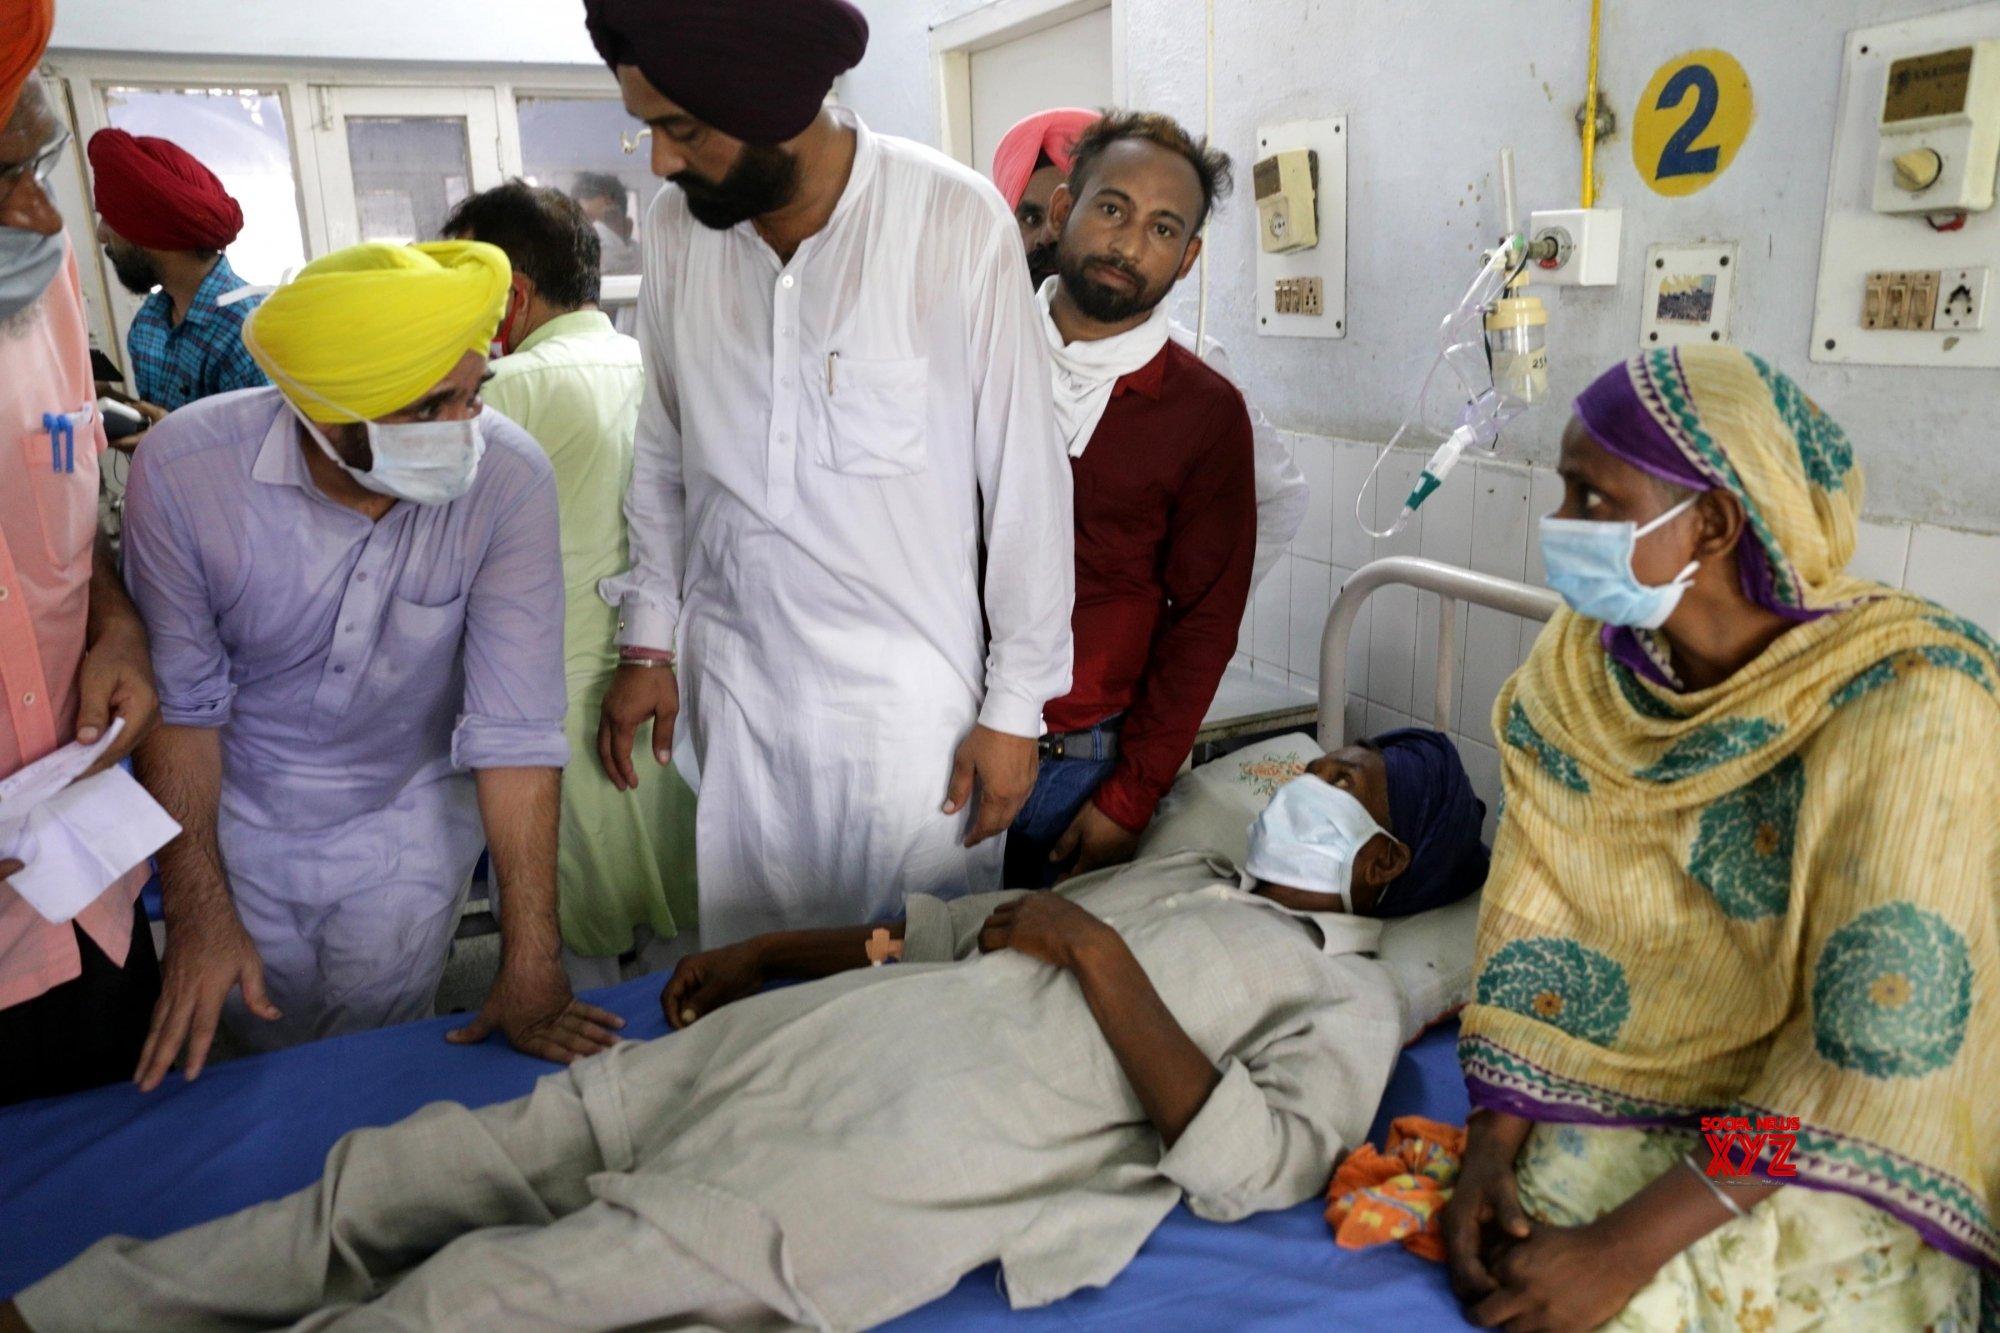 Amritsar: Hooch tragedy: Bhagwant Mann meets victims at Tarn Taran hospital #Gallery